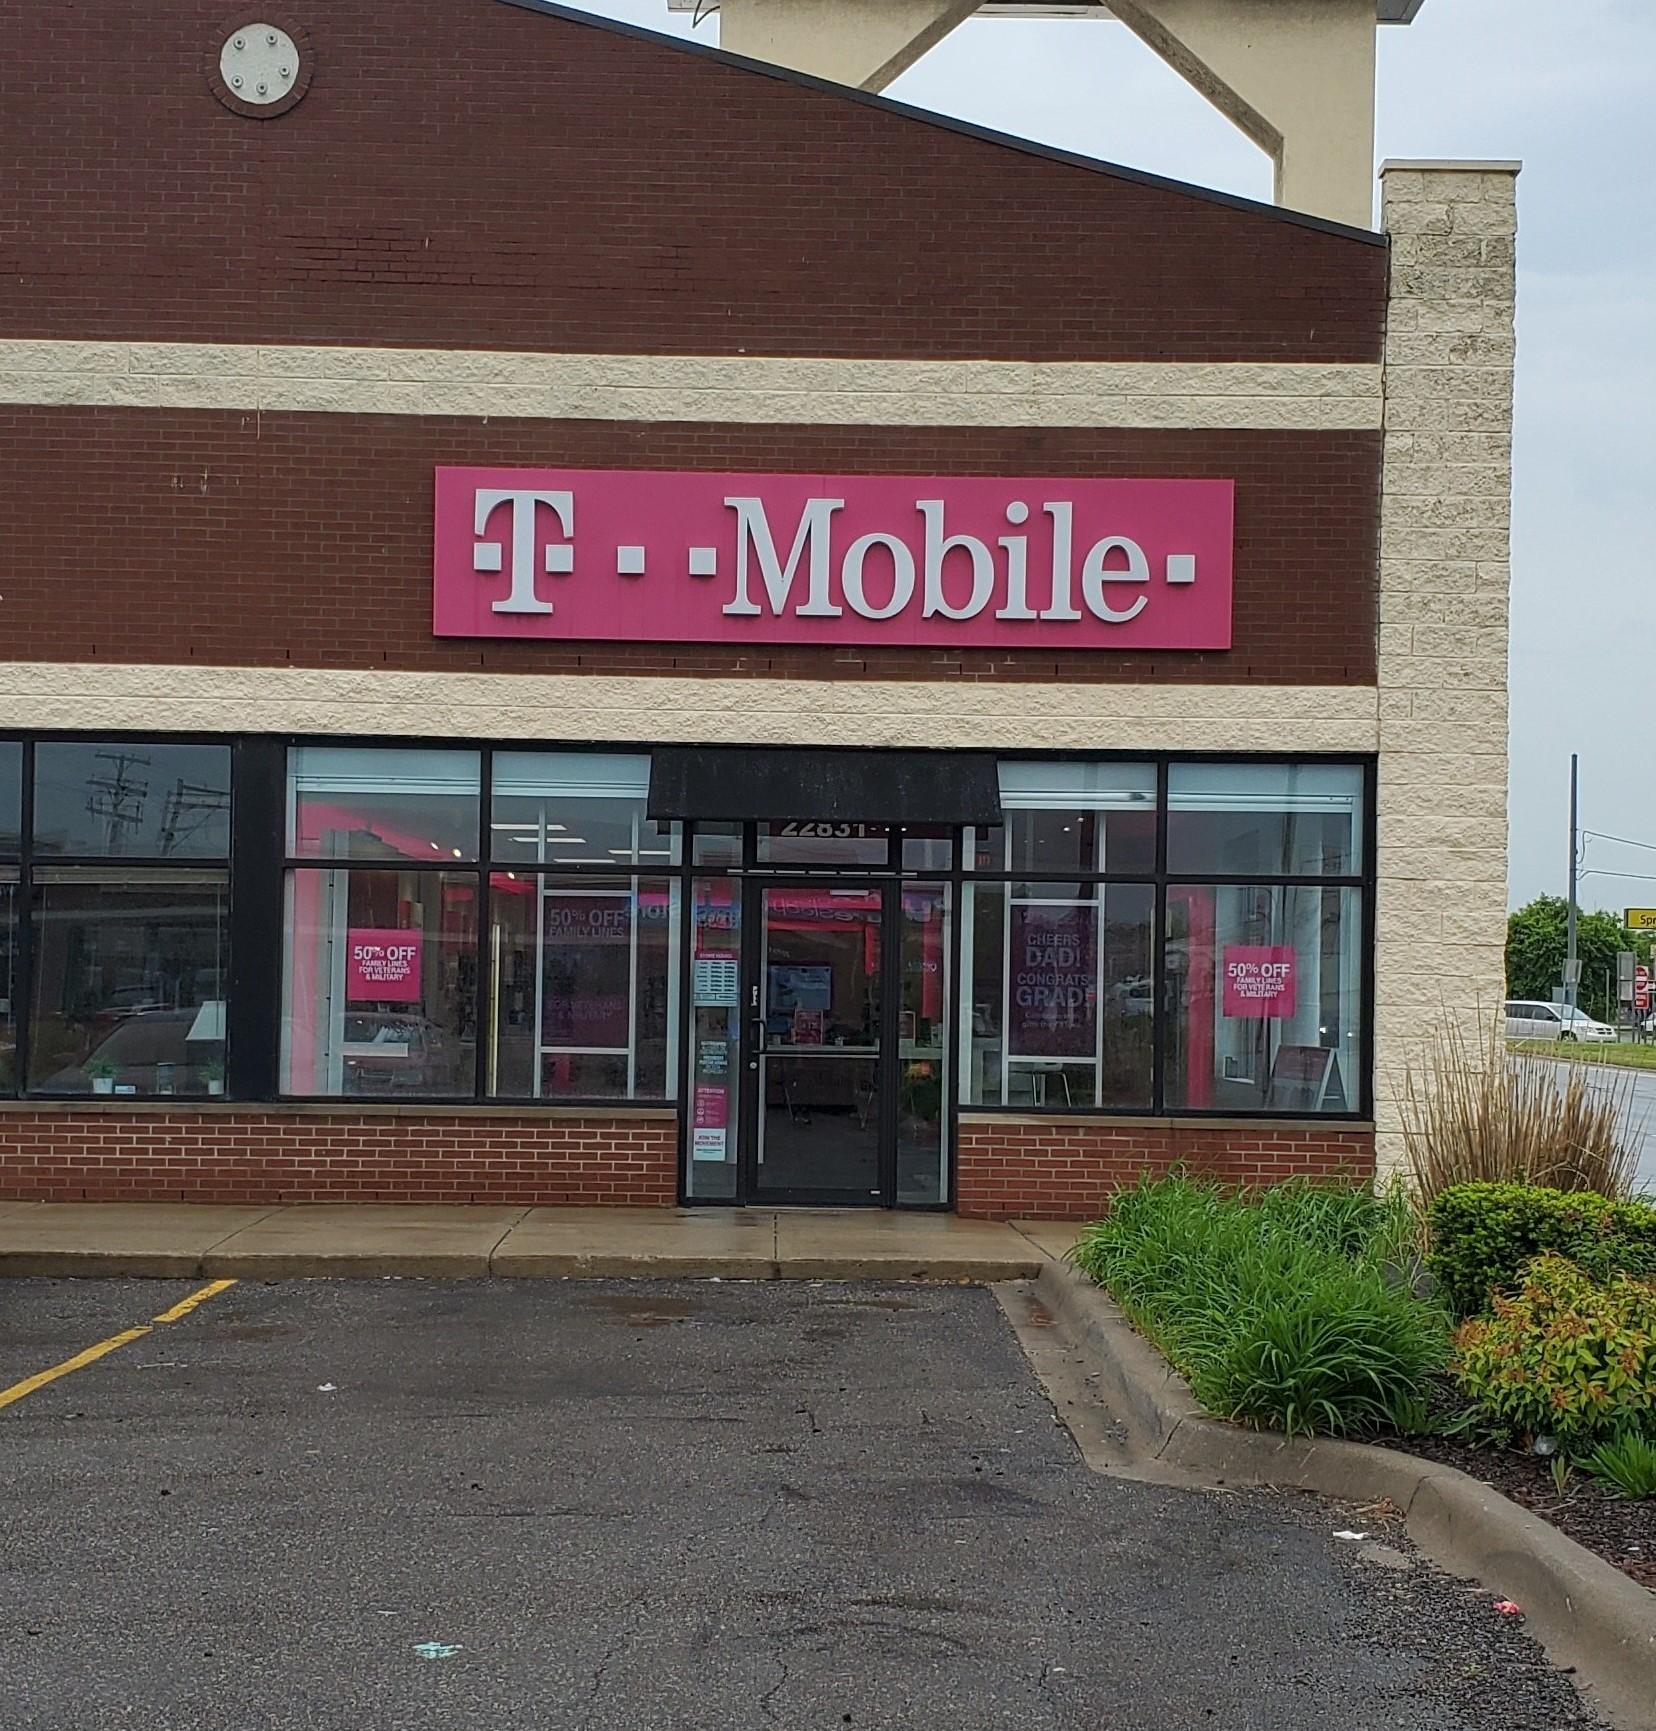 T-Mobile Dearborn (313)561-6000